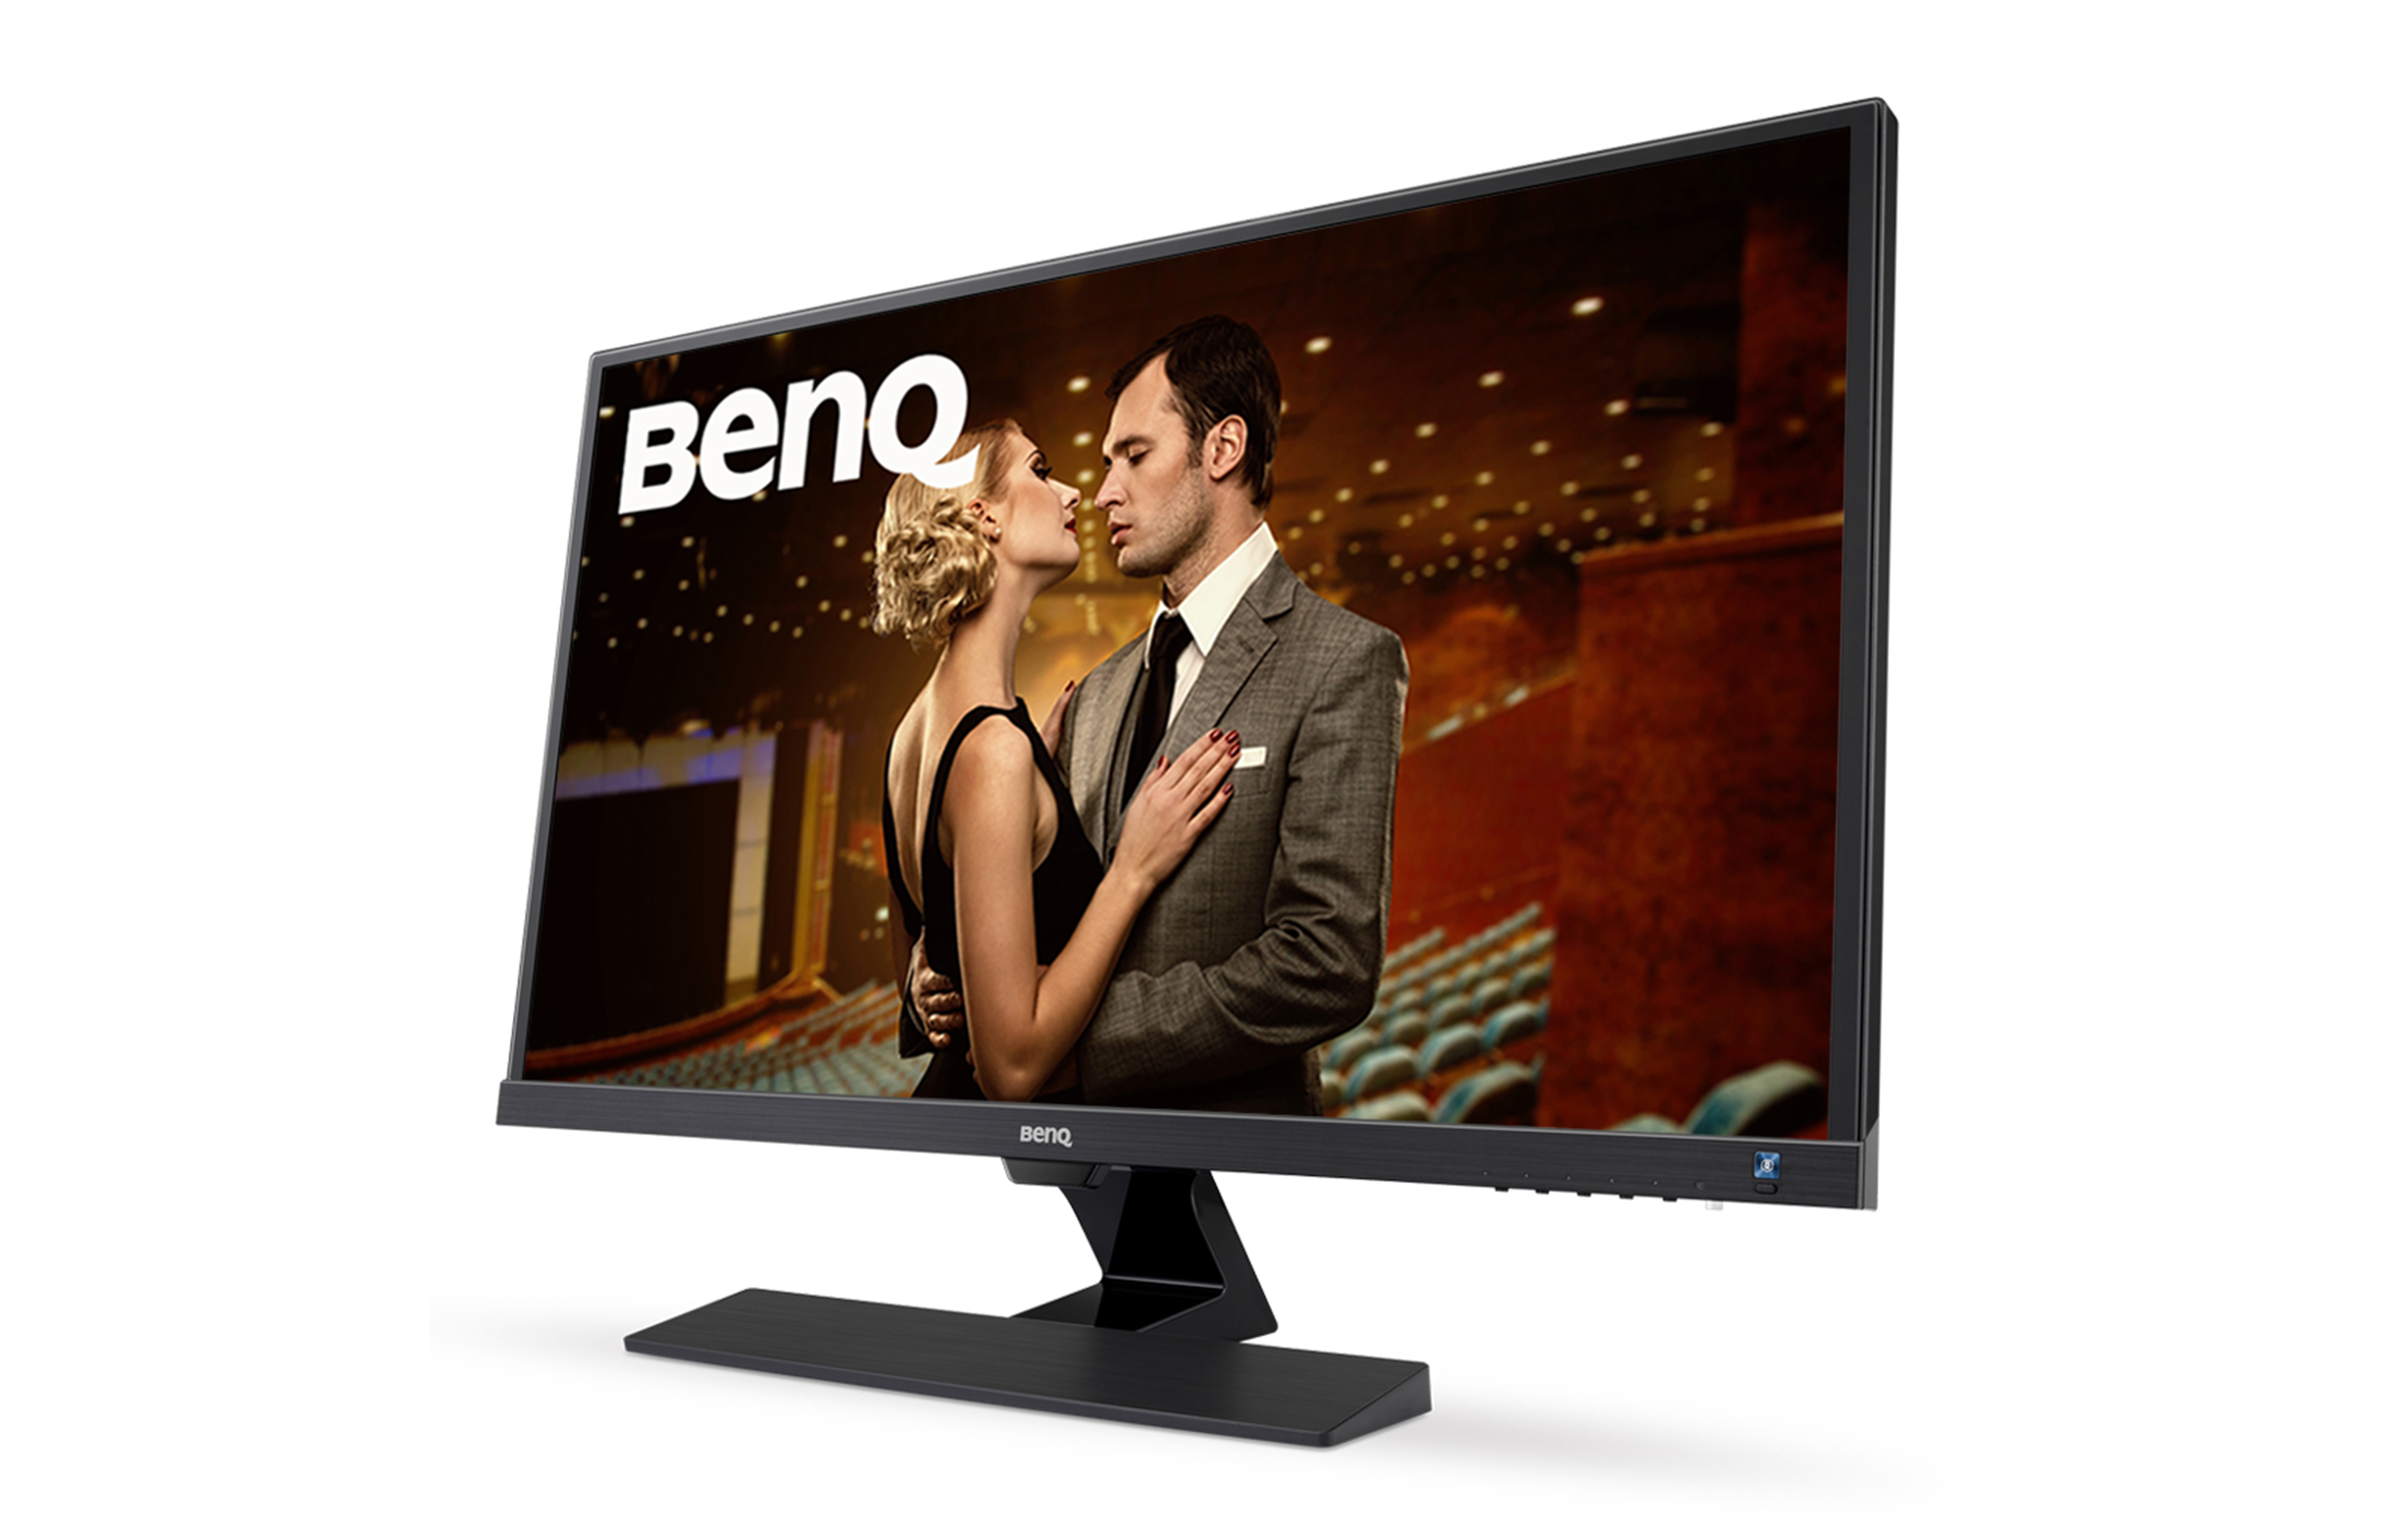 BenQ LCD EW3270ZL 32'' wide/AMVA+ LED/WQHD 2560x1440/4ms/HDMI/DP/MiniDP/repro/Flicker-free/Low Blue Light